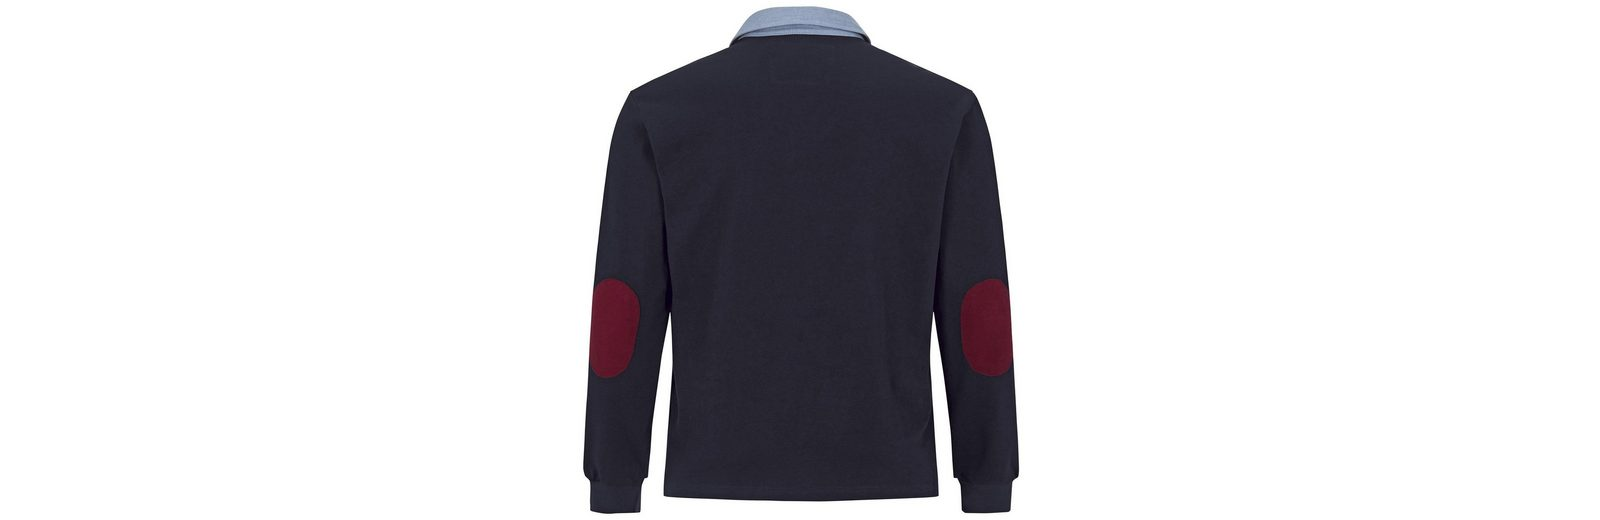 Jan Vanderstorm Sweatshirt TOVIAS  Wie Viel Lh1bh23